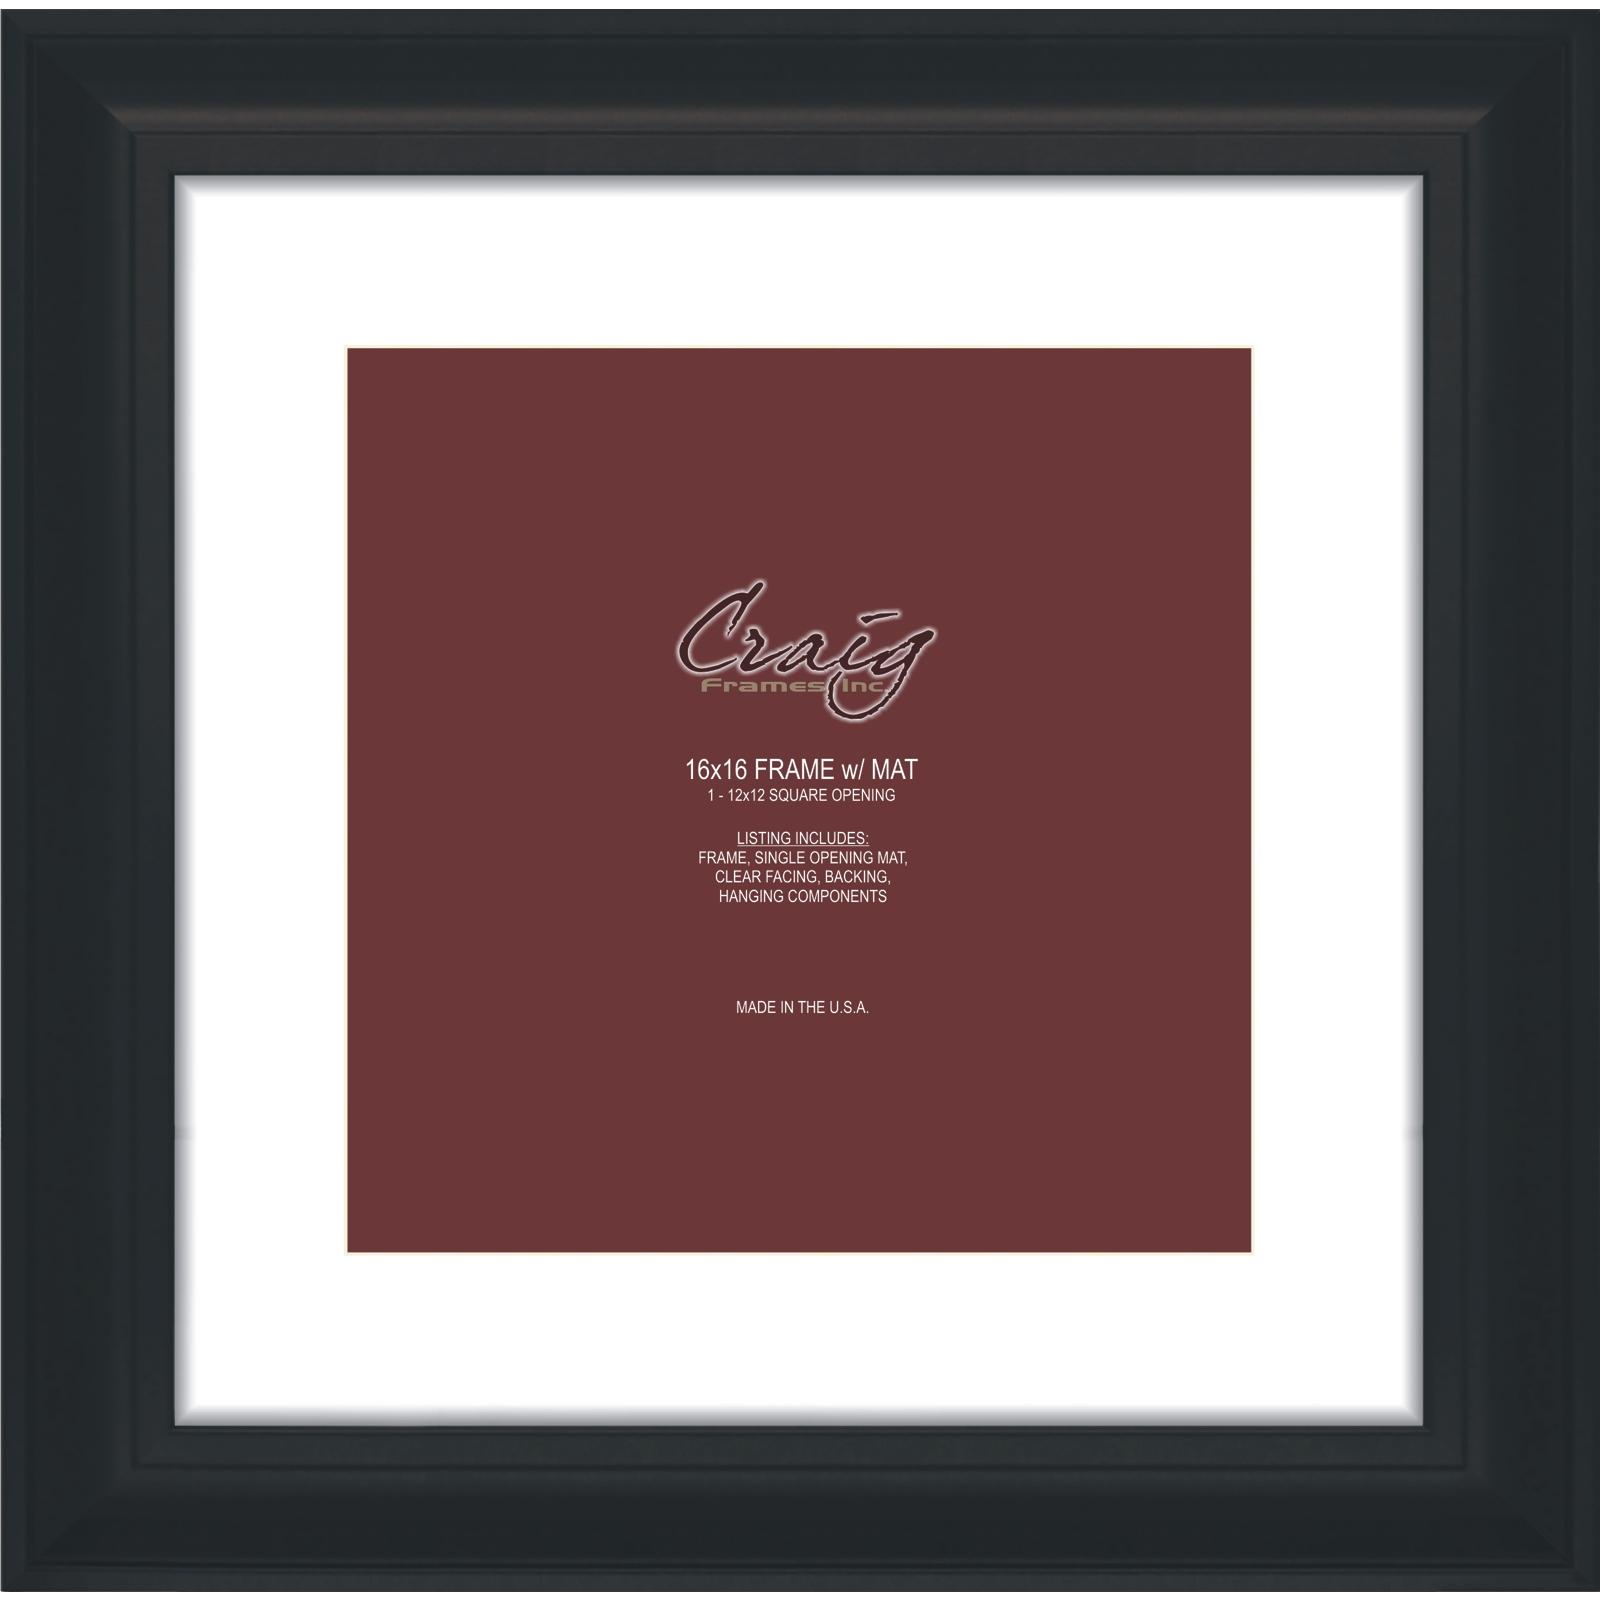 "Craig Frames Inc 16 x 16 Contemporary Upscale Frame with 2"" Mat (21834) PartNumber: 021V007812068000P KsnValue: 7812068 MfgPartNumber: 581161601B14A"